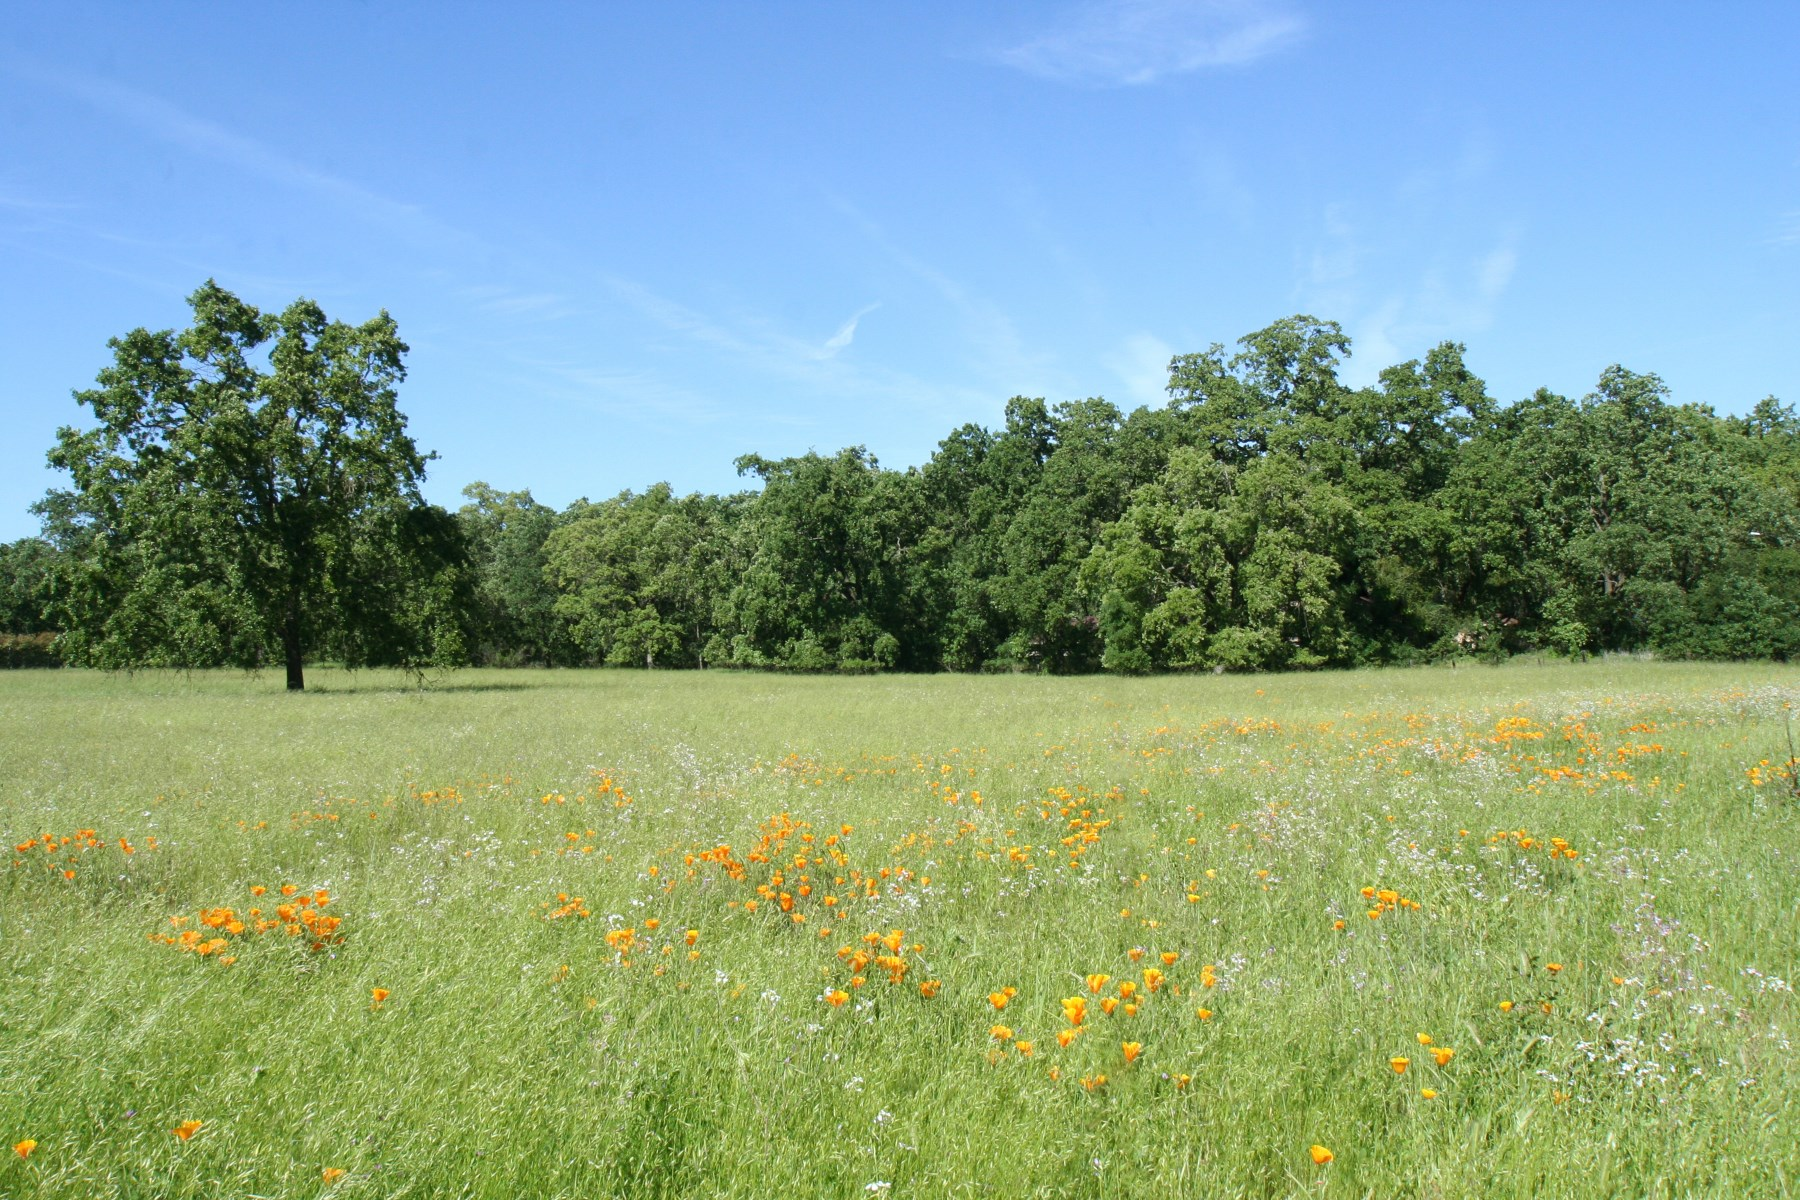 Land for Sale at Sonoma Valley Acreage 0 Arnold Drive Sonoma, California 95476 United States